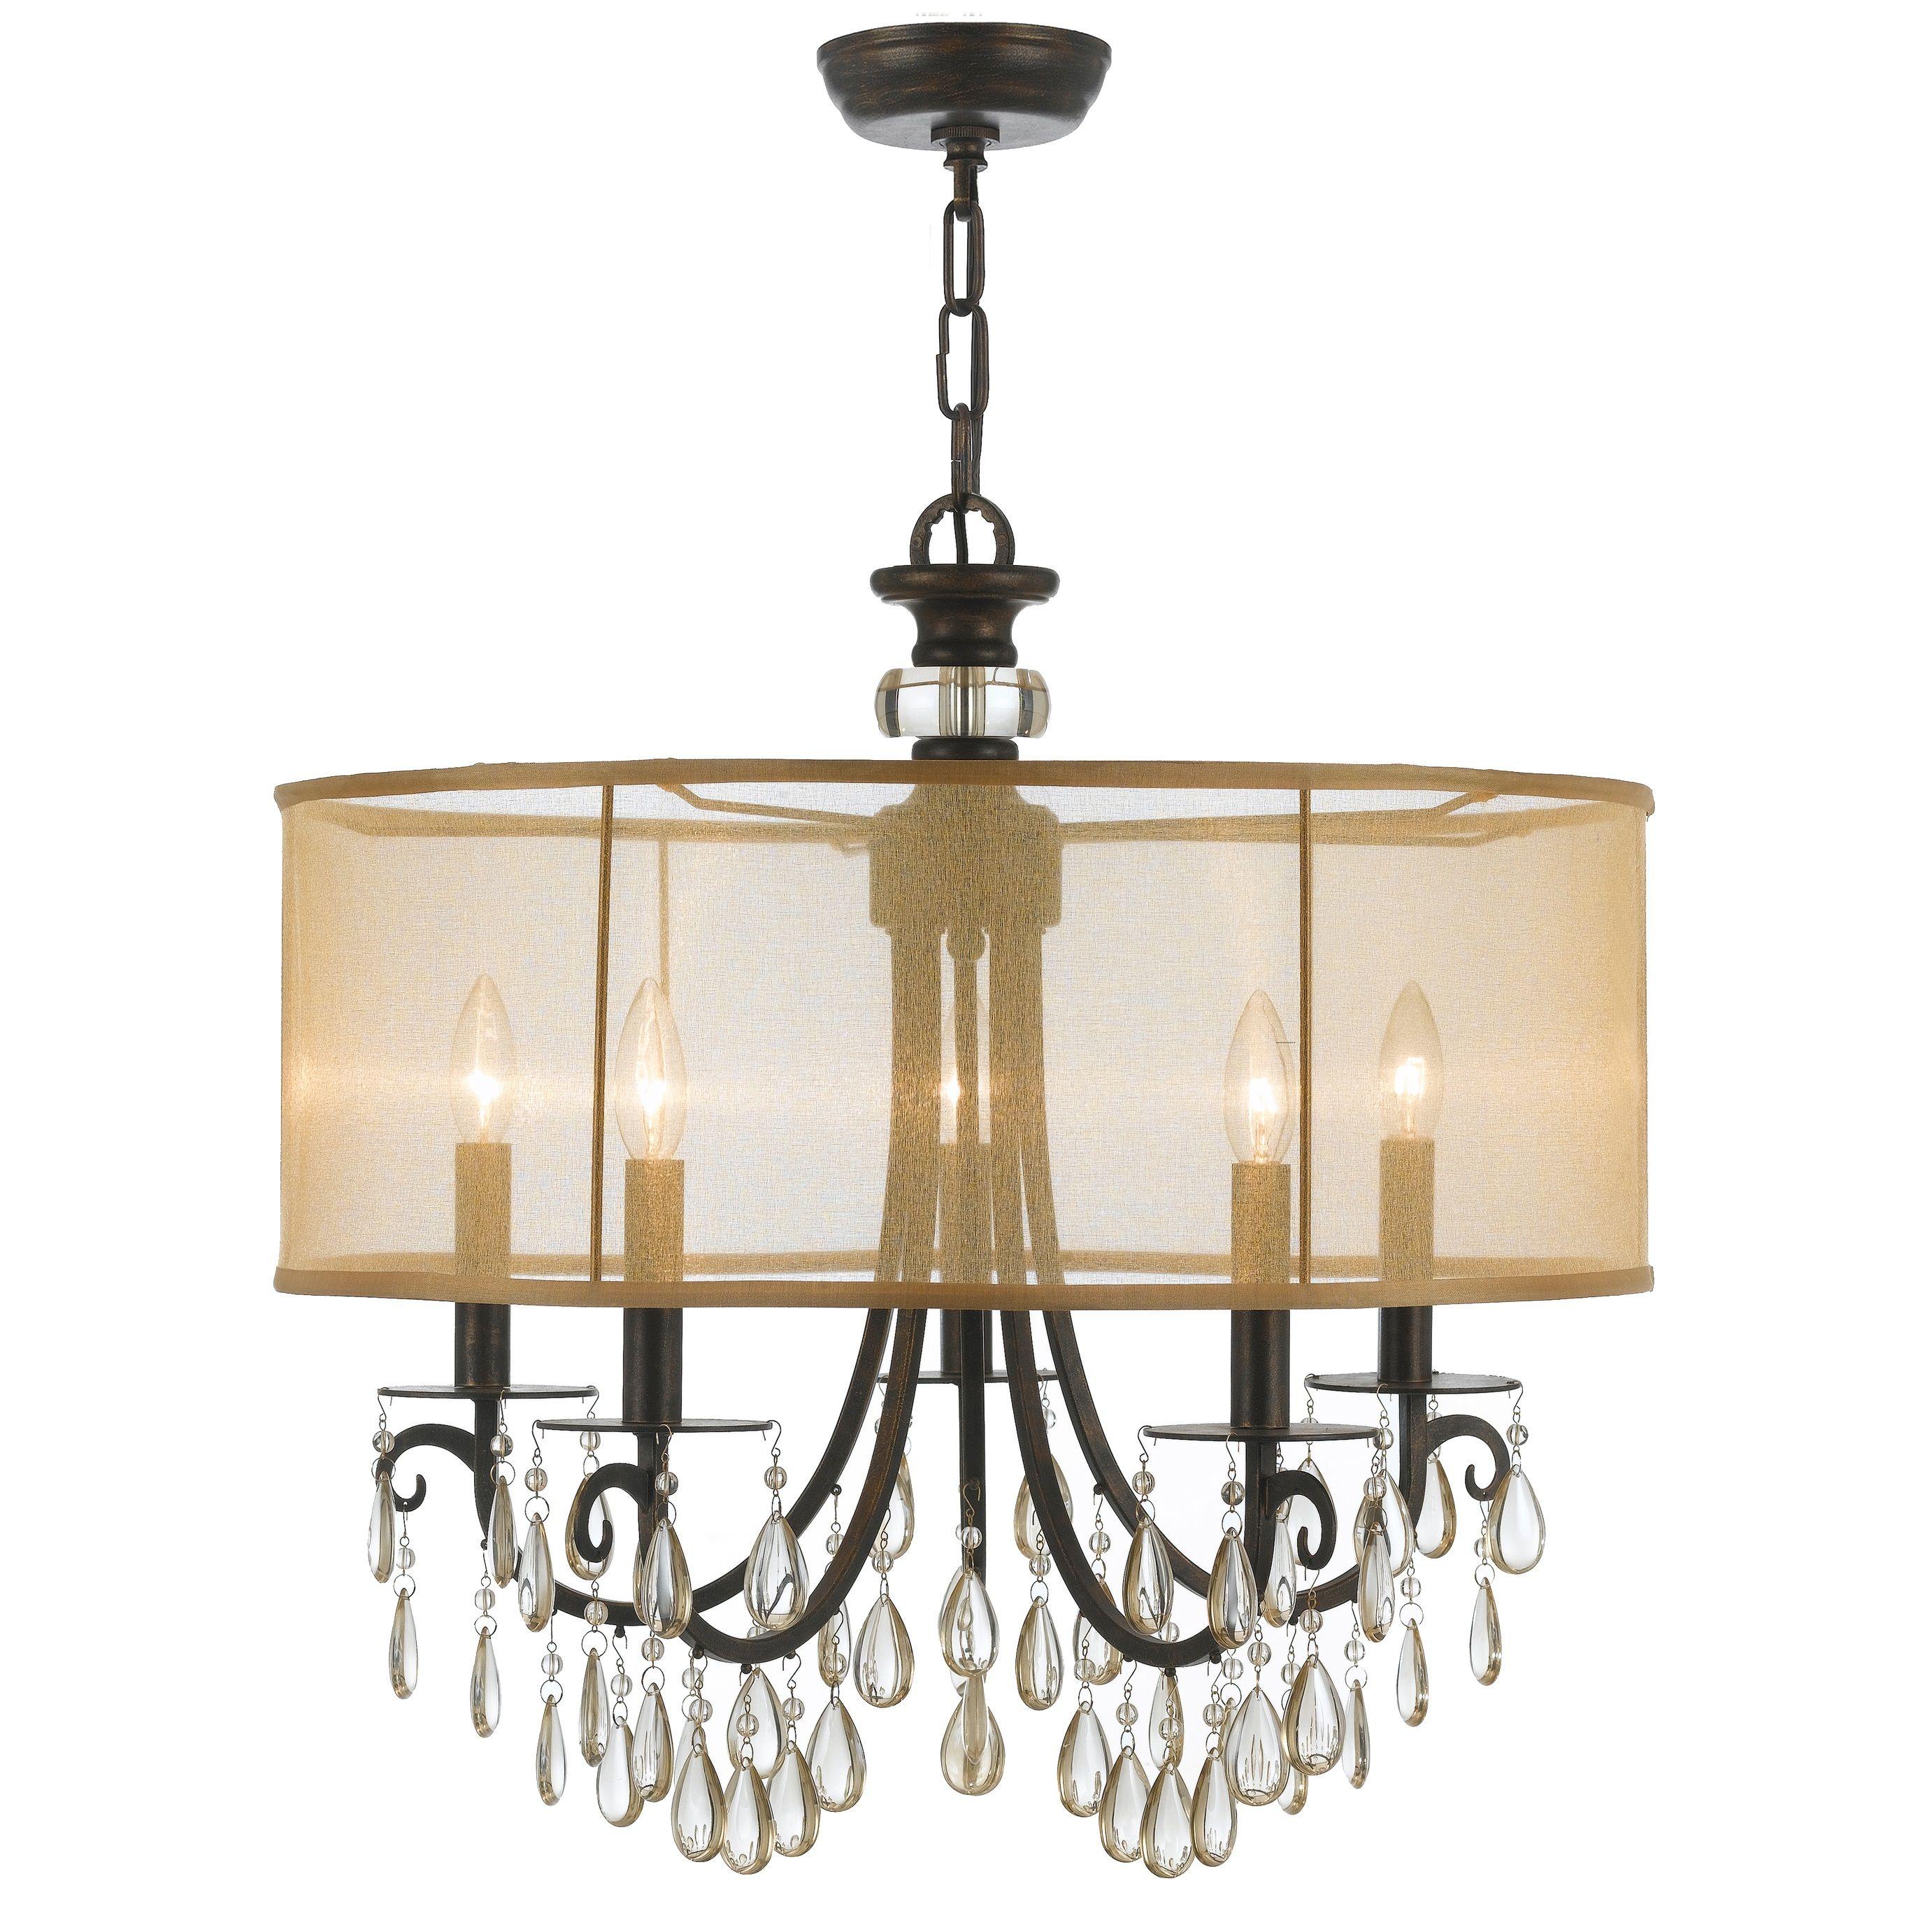 Crystorama Lighting Group 5625 EB English Bronze Hampton 5 Light